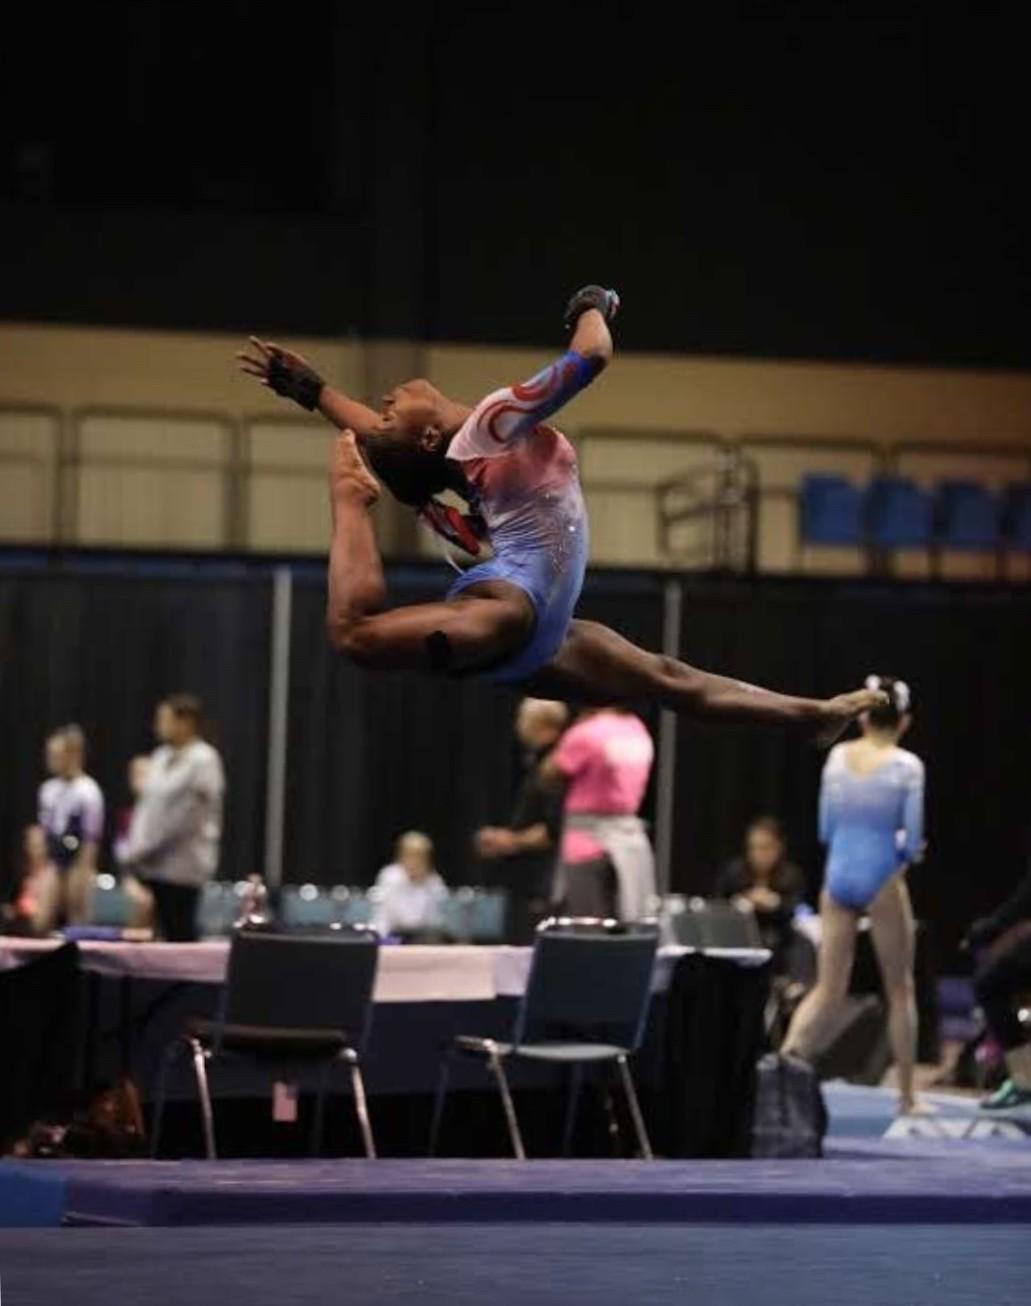 Gabriel Clark at Nationals doing her floor routine.